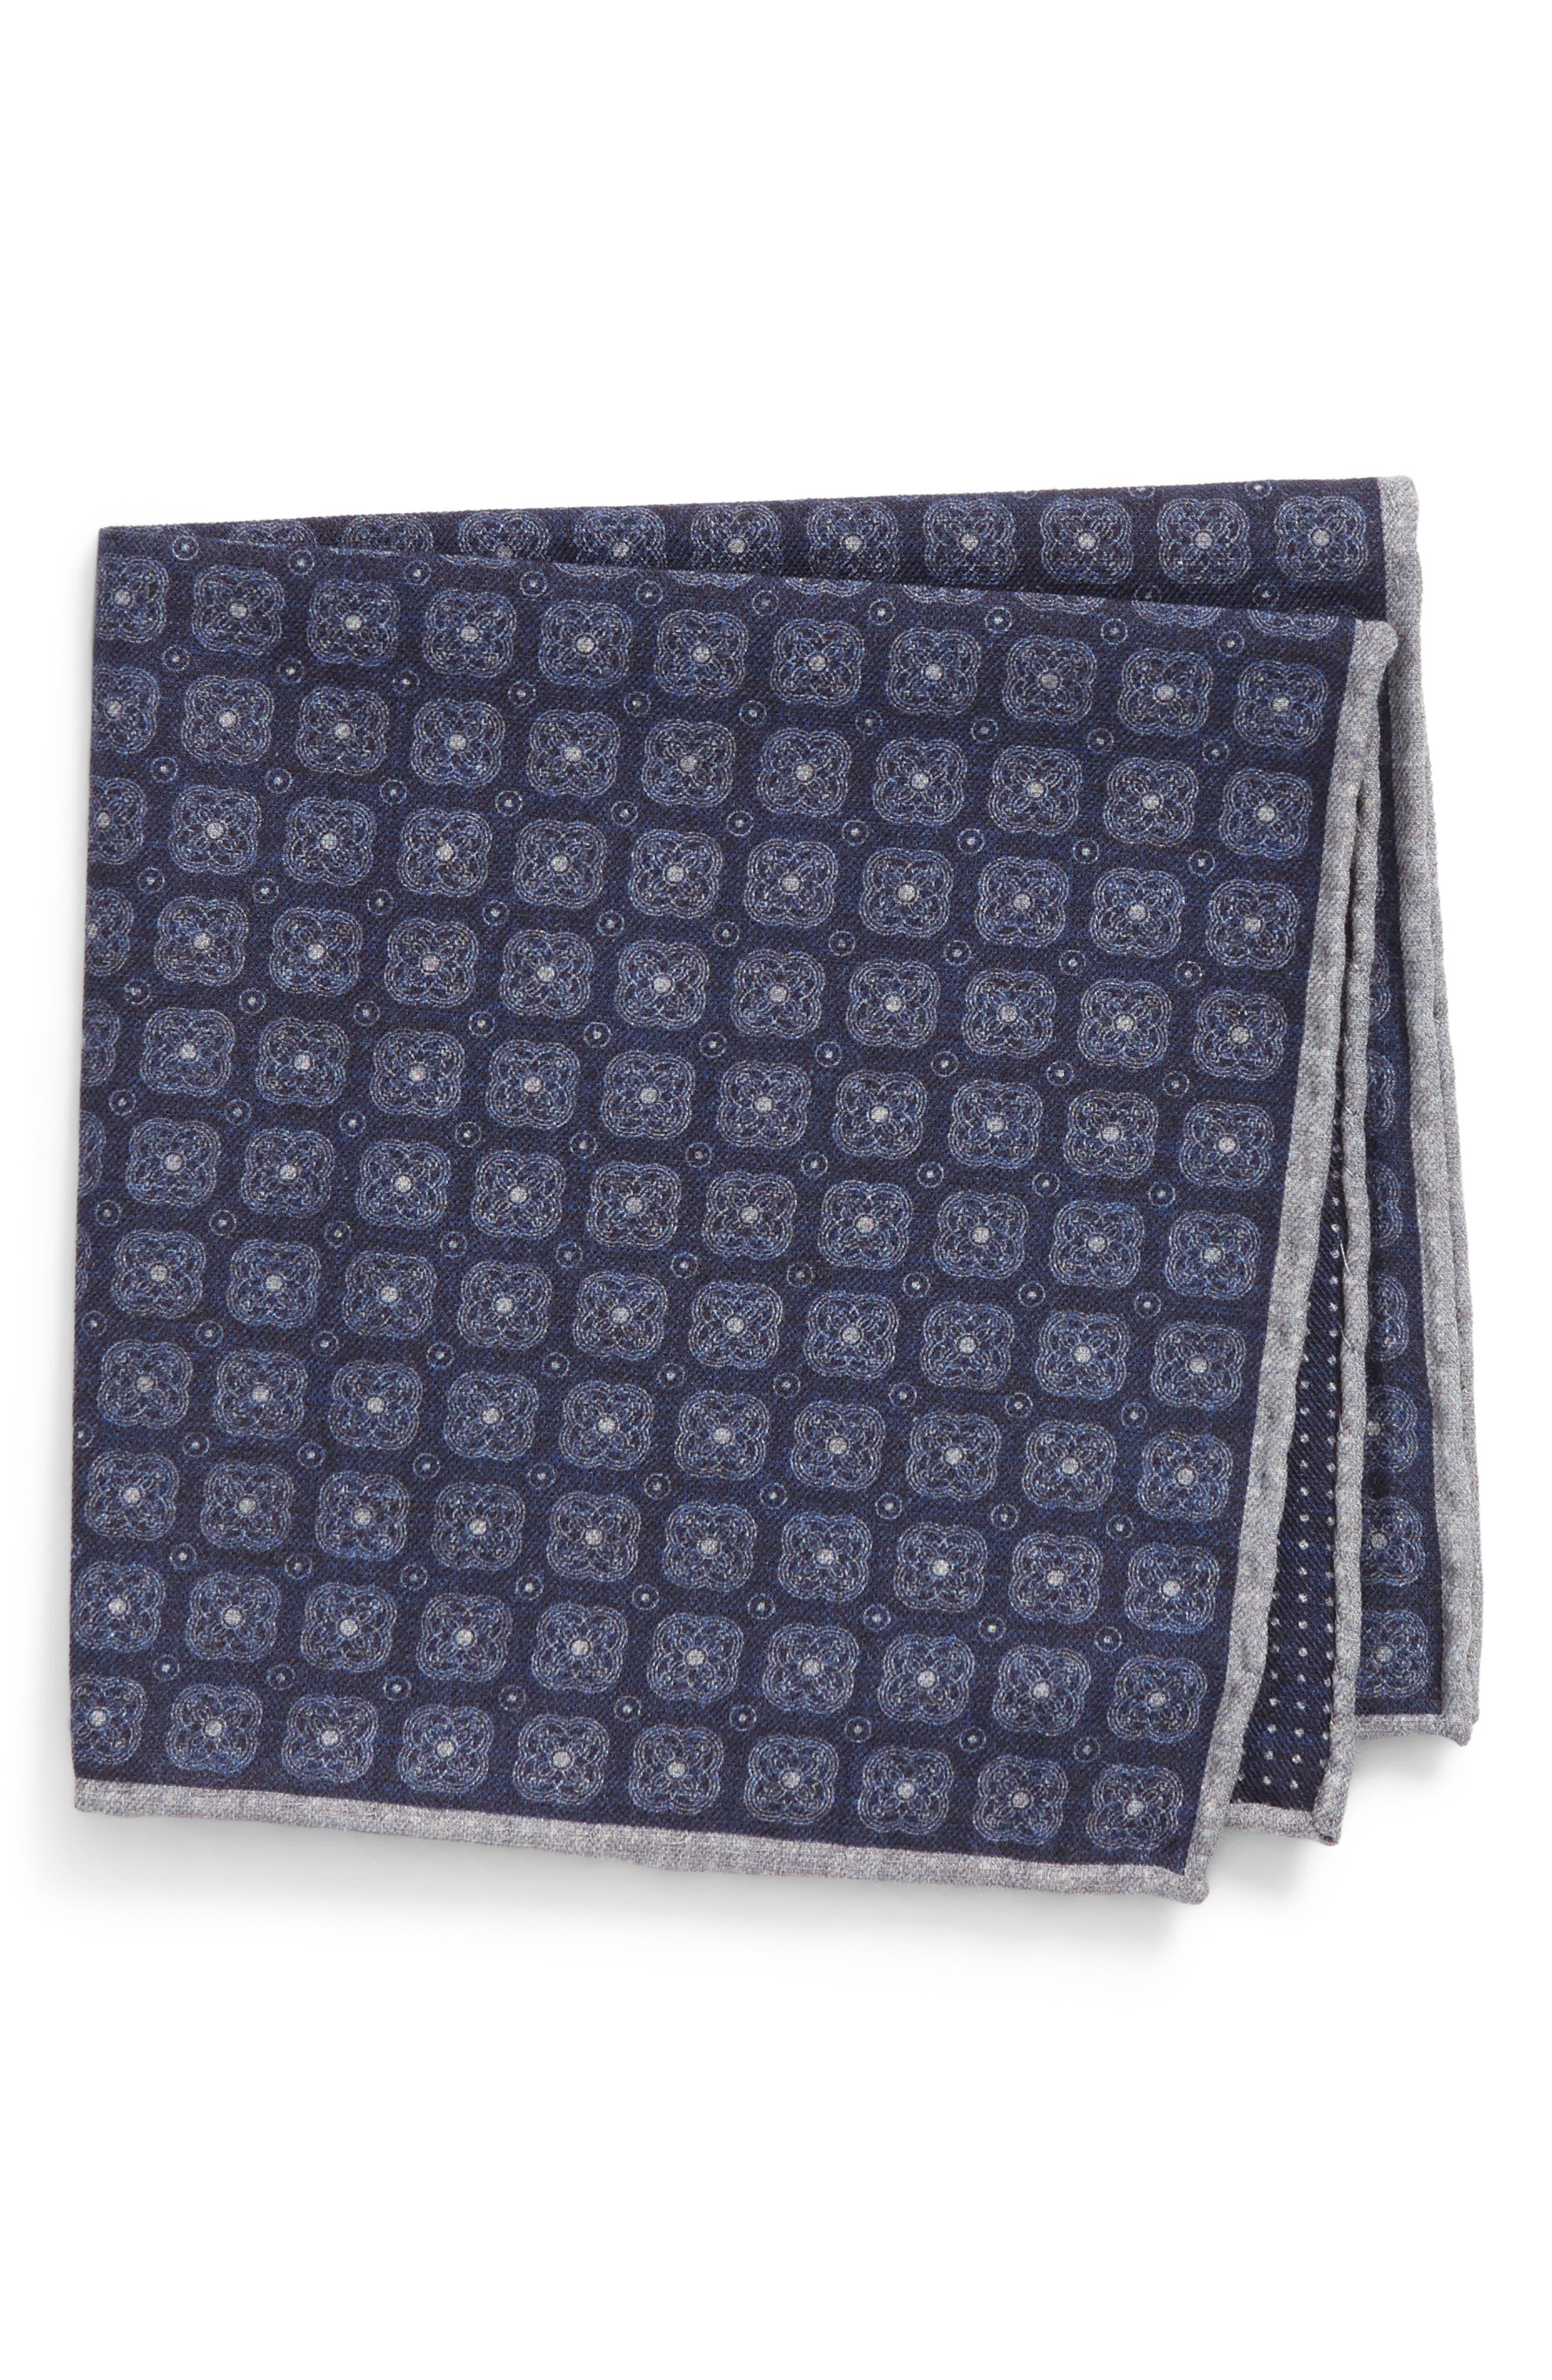 Alternate Image 1 Selected - Eleventy Medallion Wool & Cotton Pocket Square